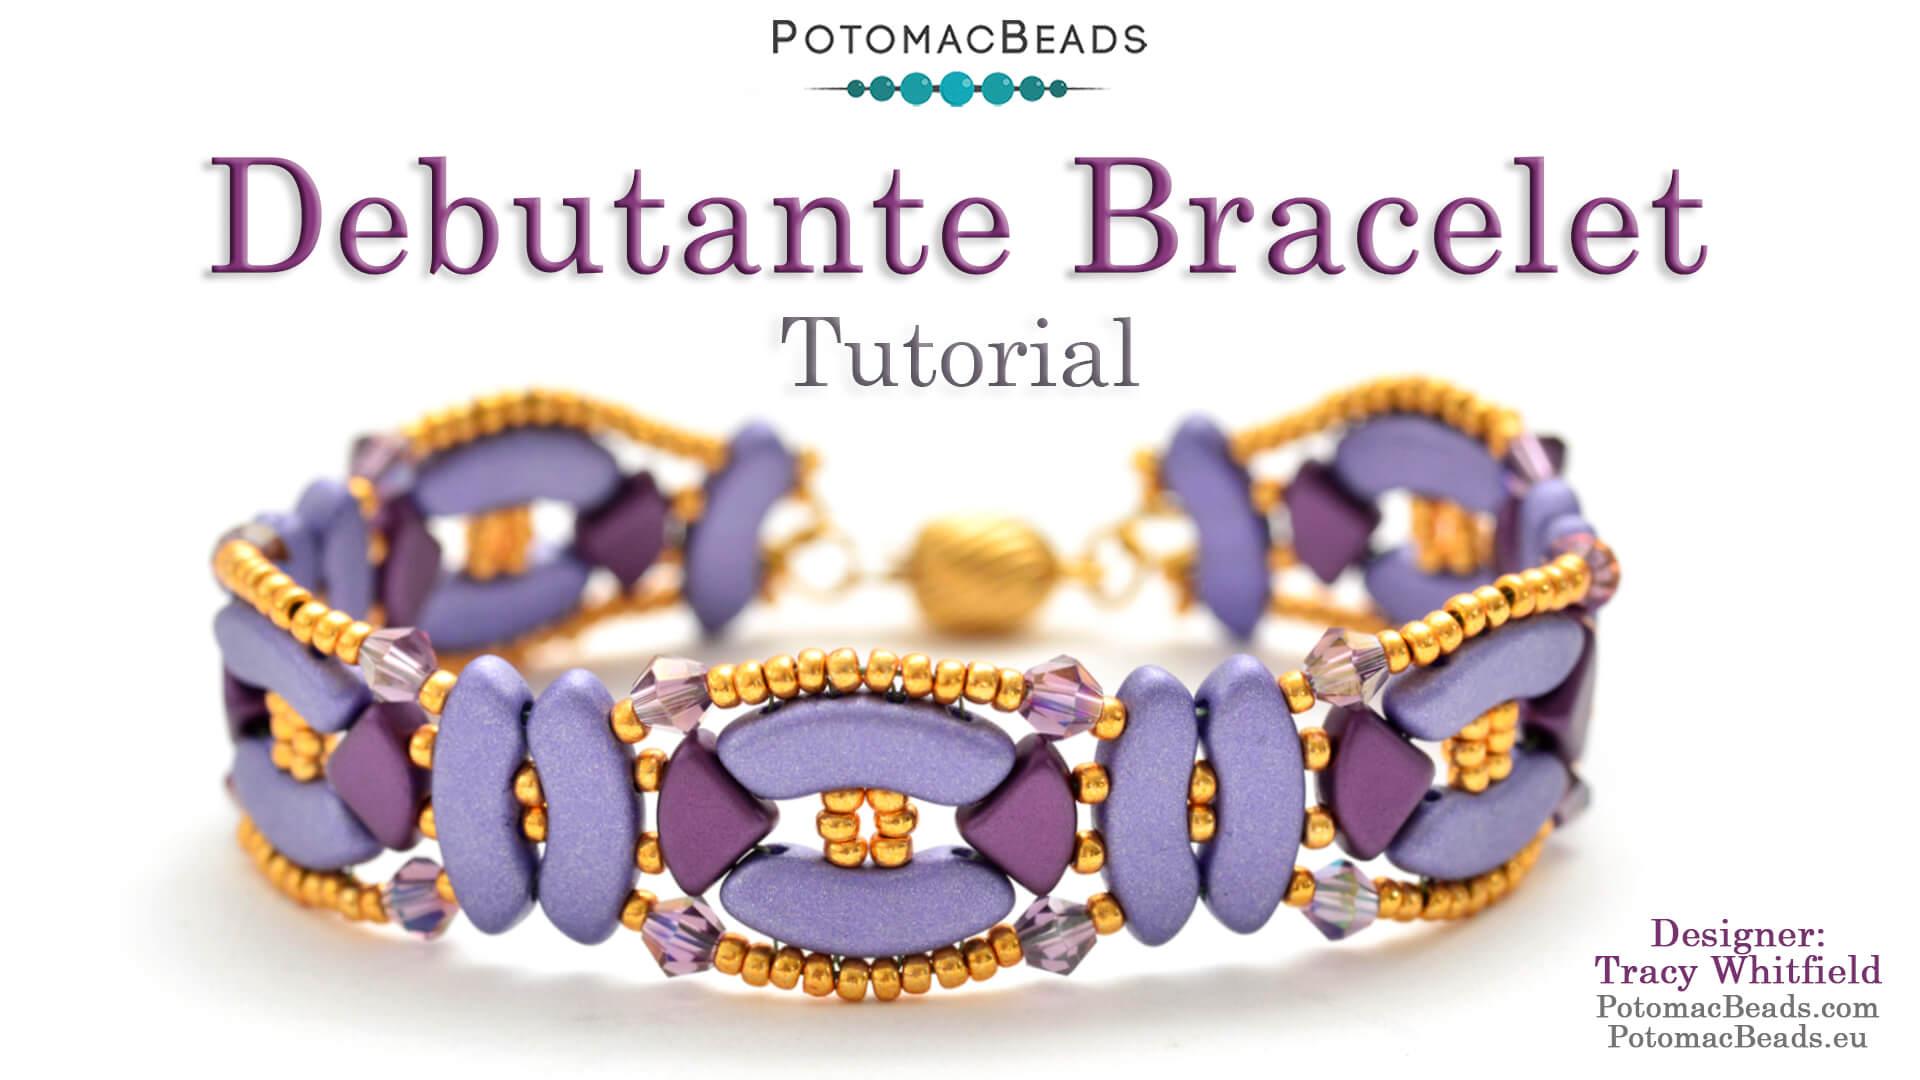 How to Bead Jewelry / Videos Sorted by Beads / QuadBow & PieDuo Bead Videos / Debutante Bracelet Tutorial